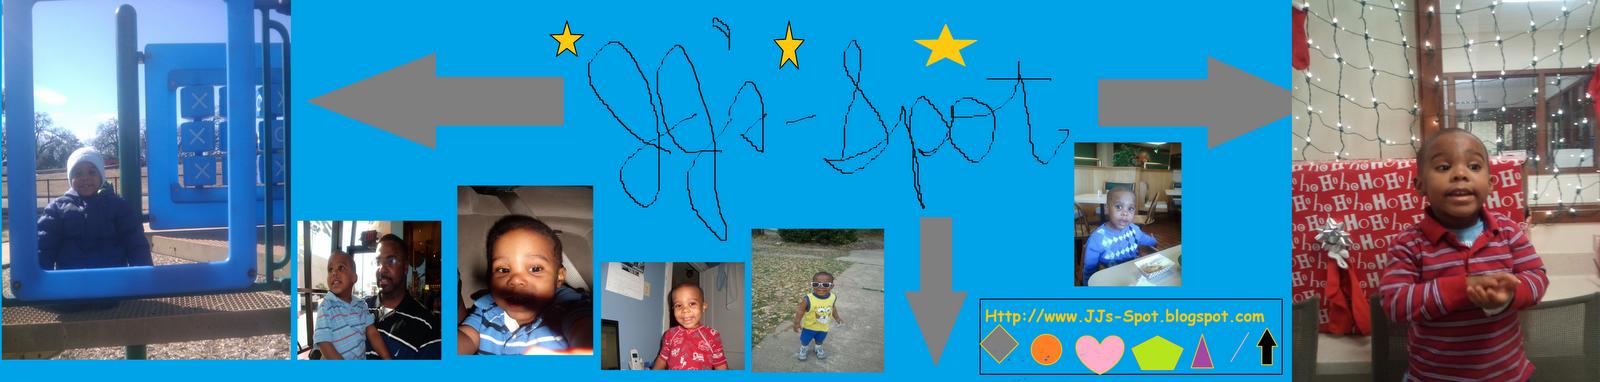 JJs-Spot